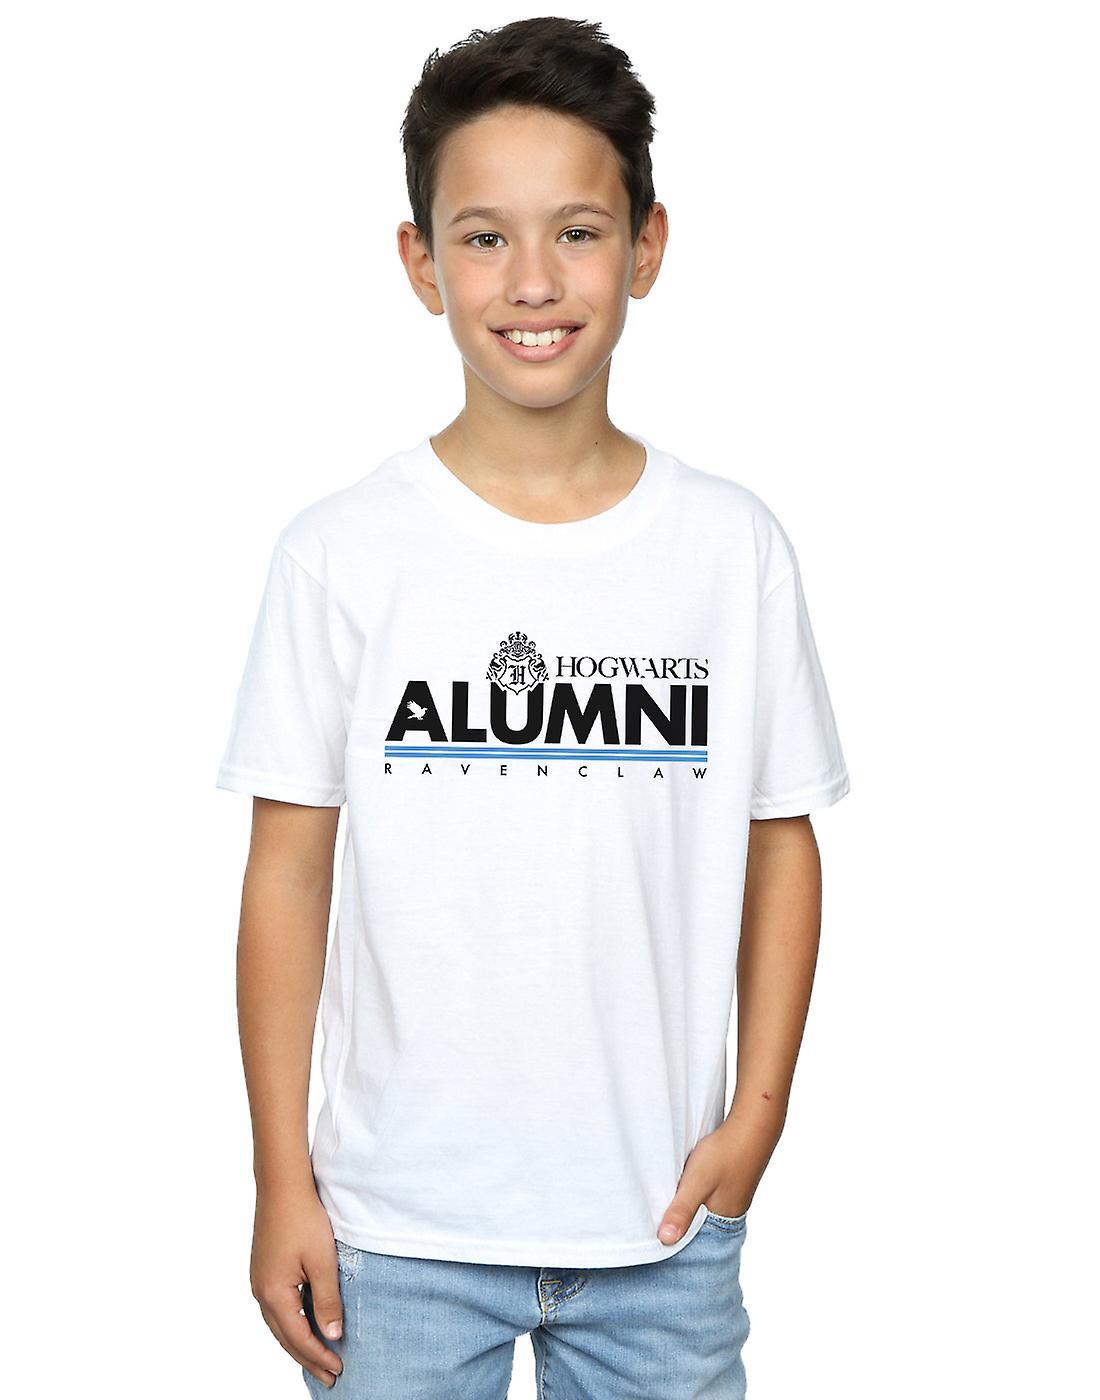 Harry Potter Boys Hogwarts Alumni Ravenclaw T-Shirt